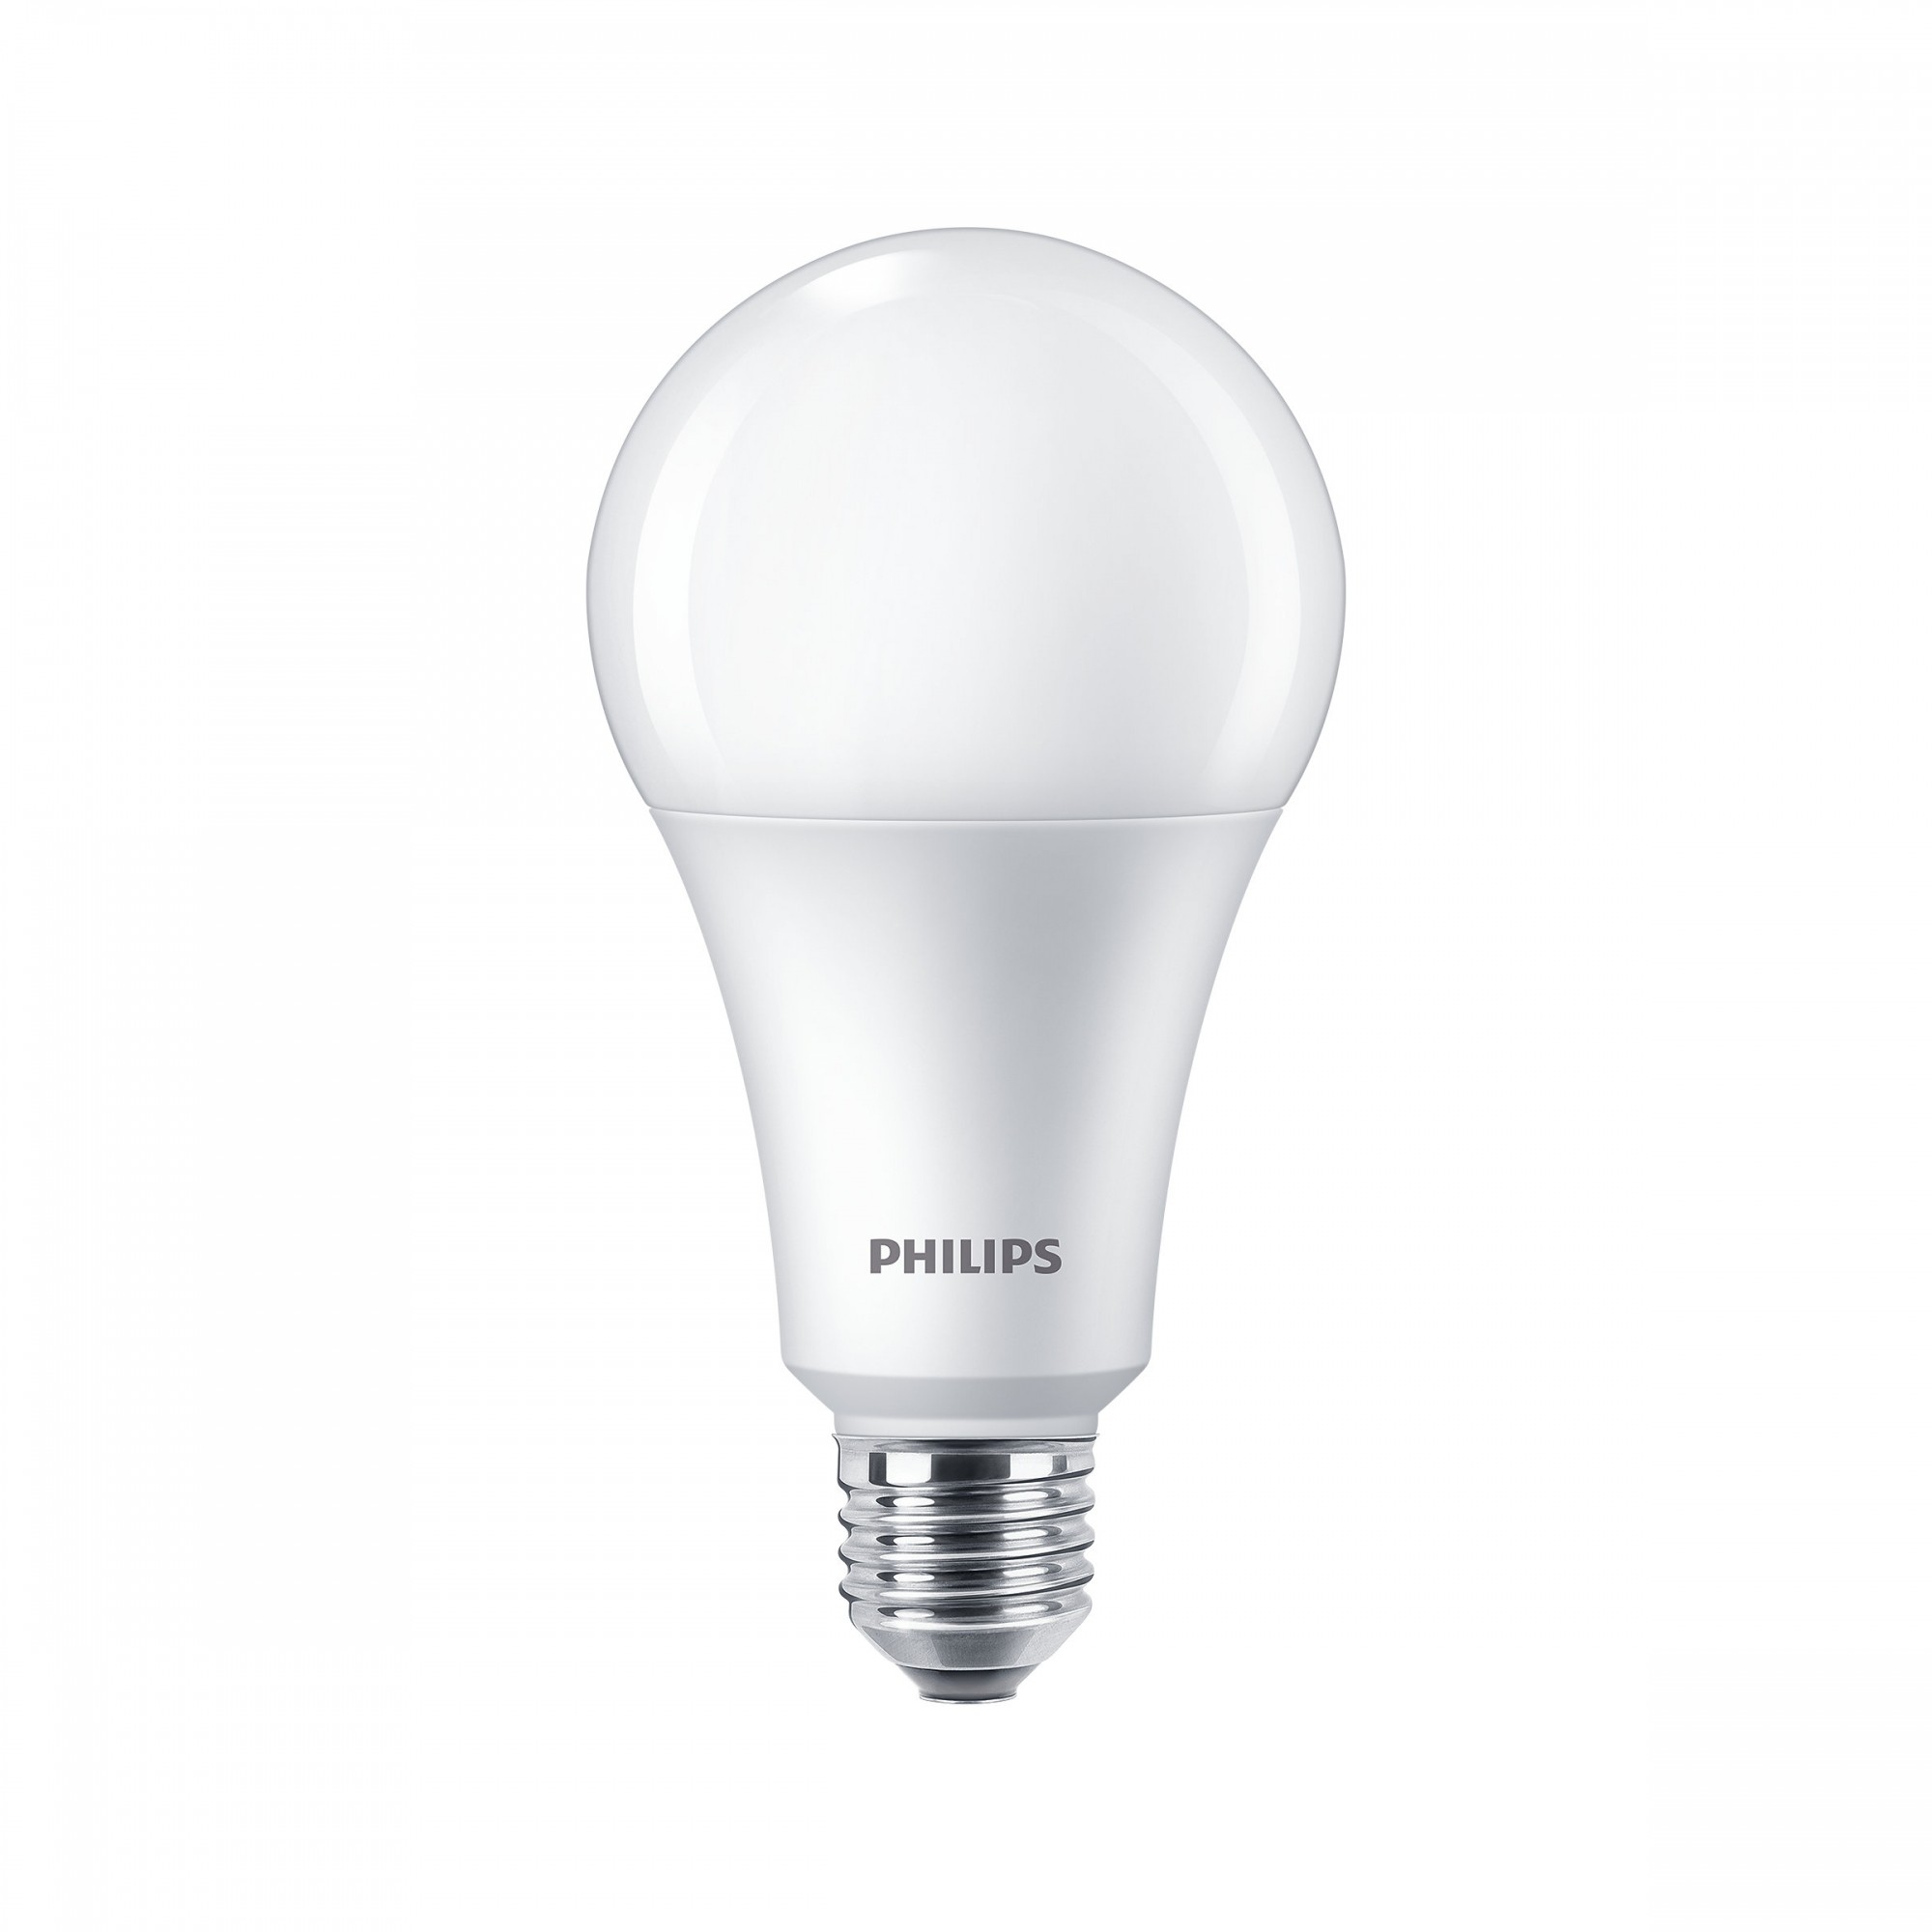 LAMPADA LED BULBO 19W E27 BIVOLT NORM 6500K PHILIPS 929002003192